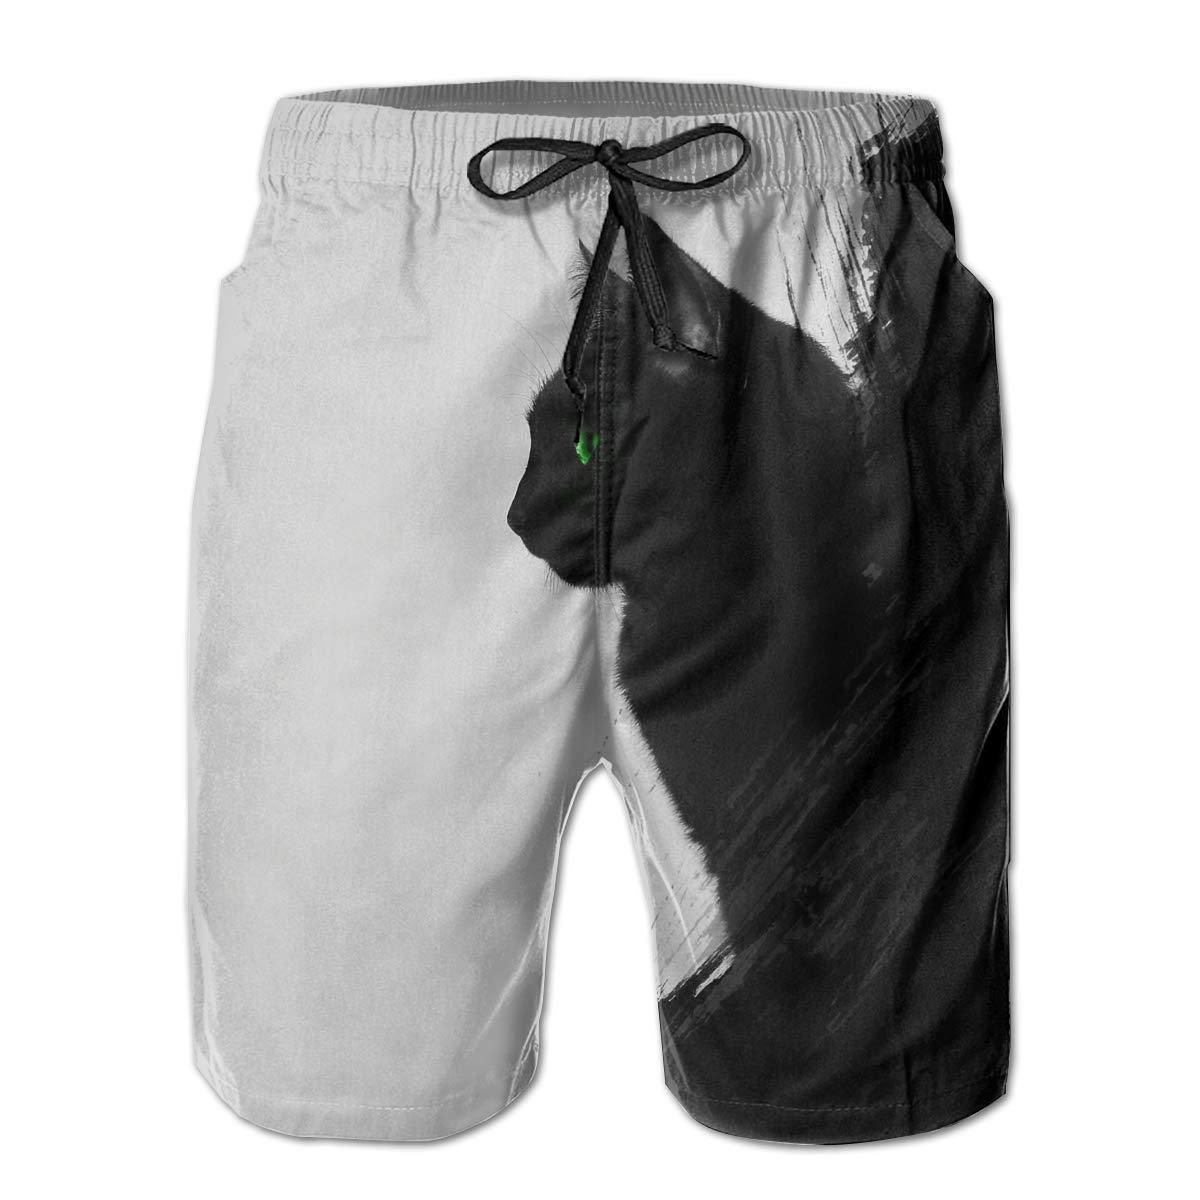 b5476058a3db9 White Mens Black Black Black Cat Shorts Lightweight Swim Trunks Beach  Shorts,Boardshort 81f4ff